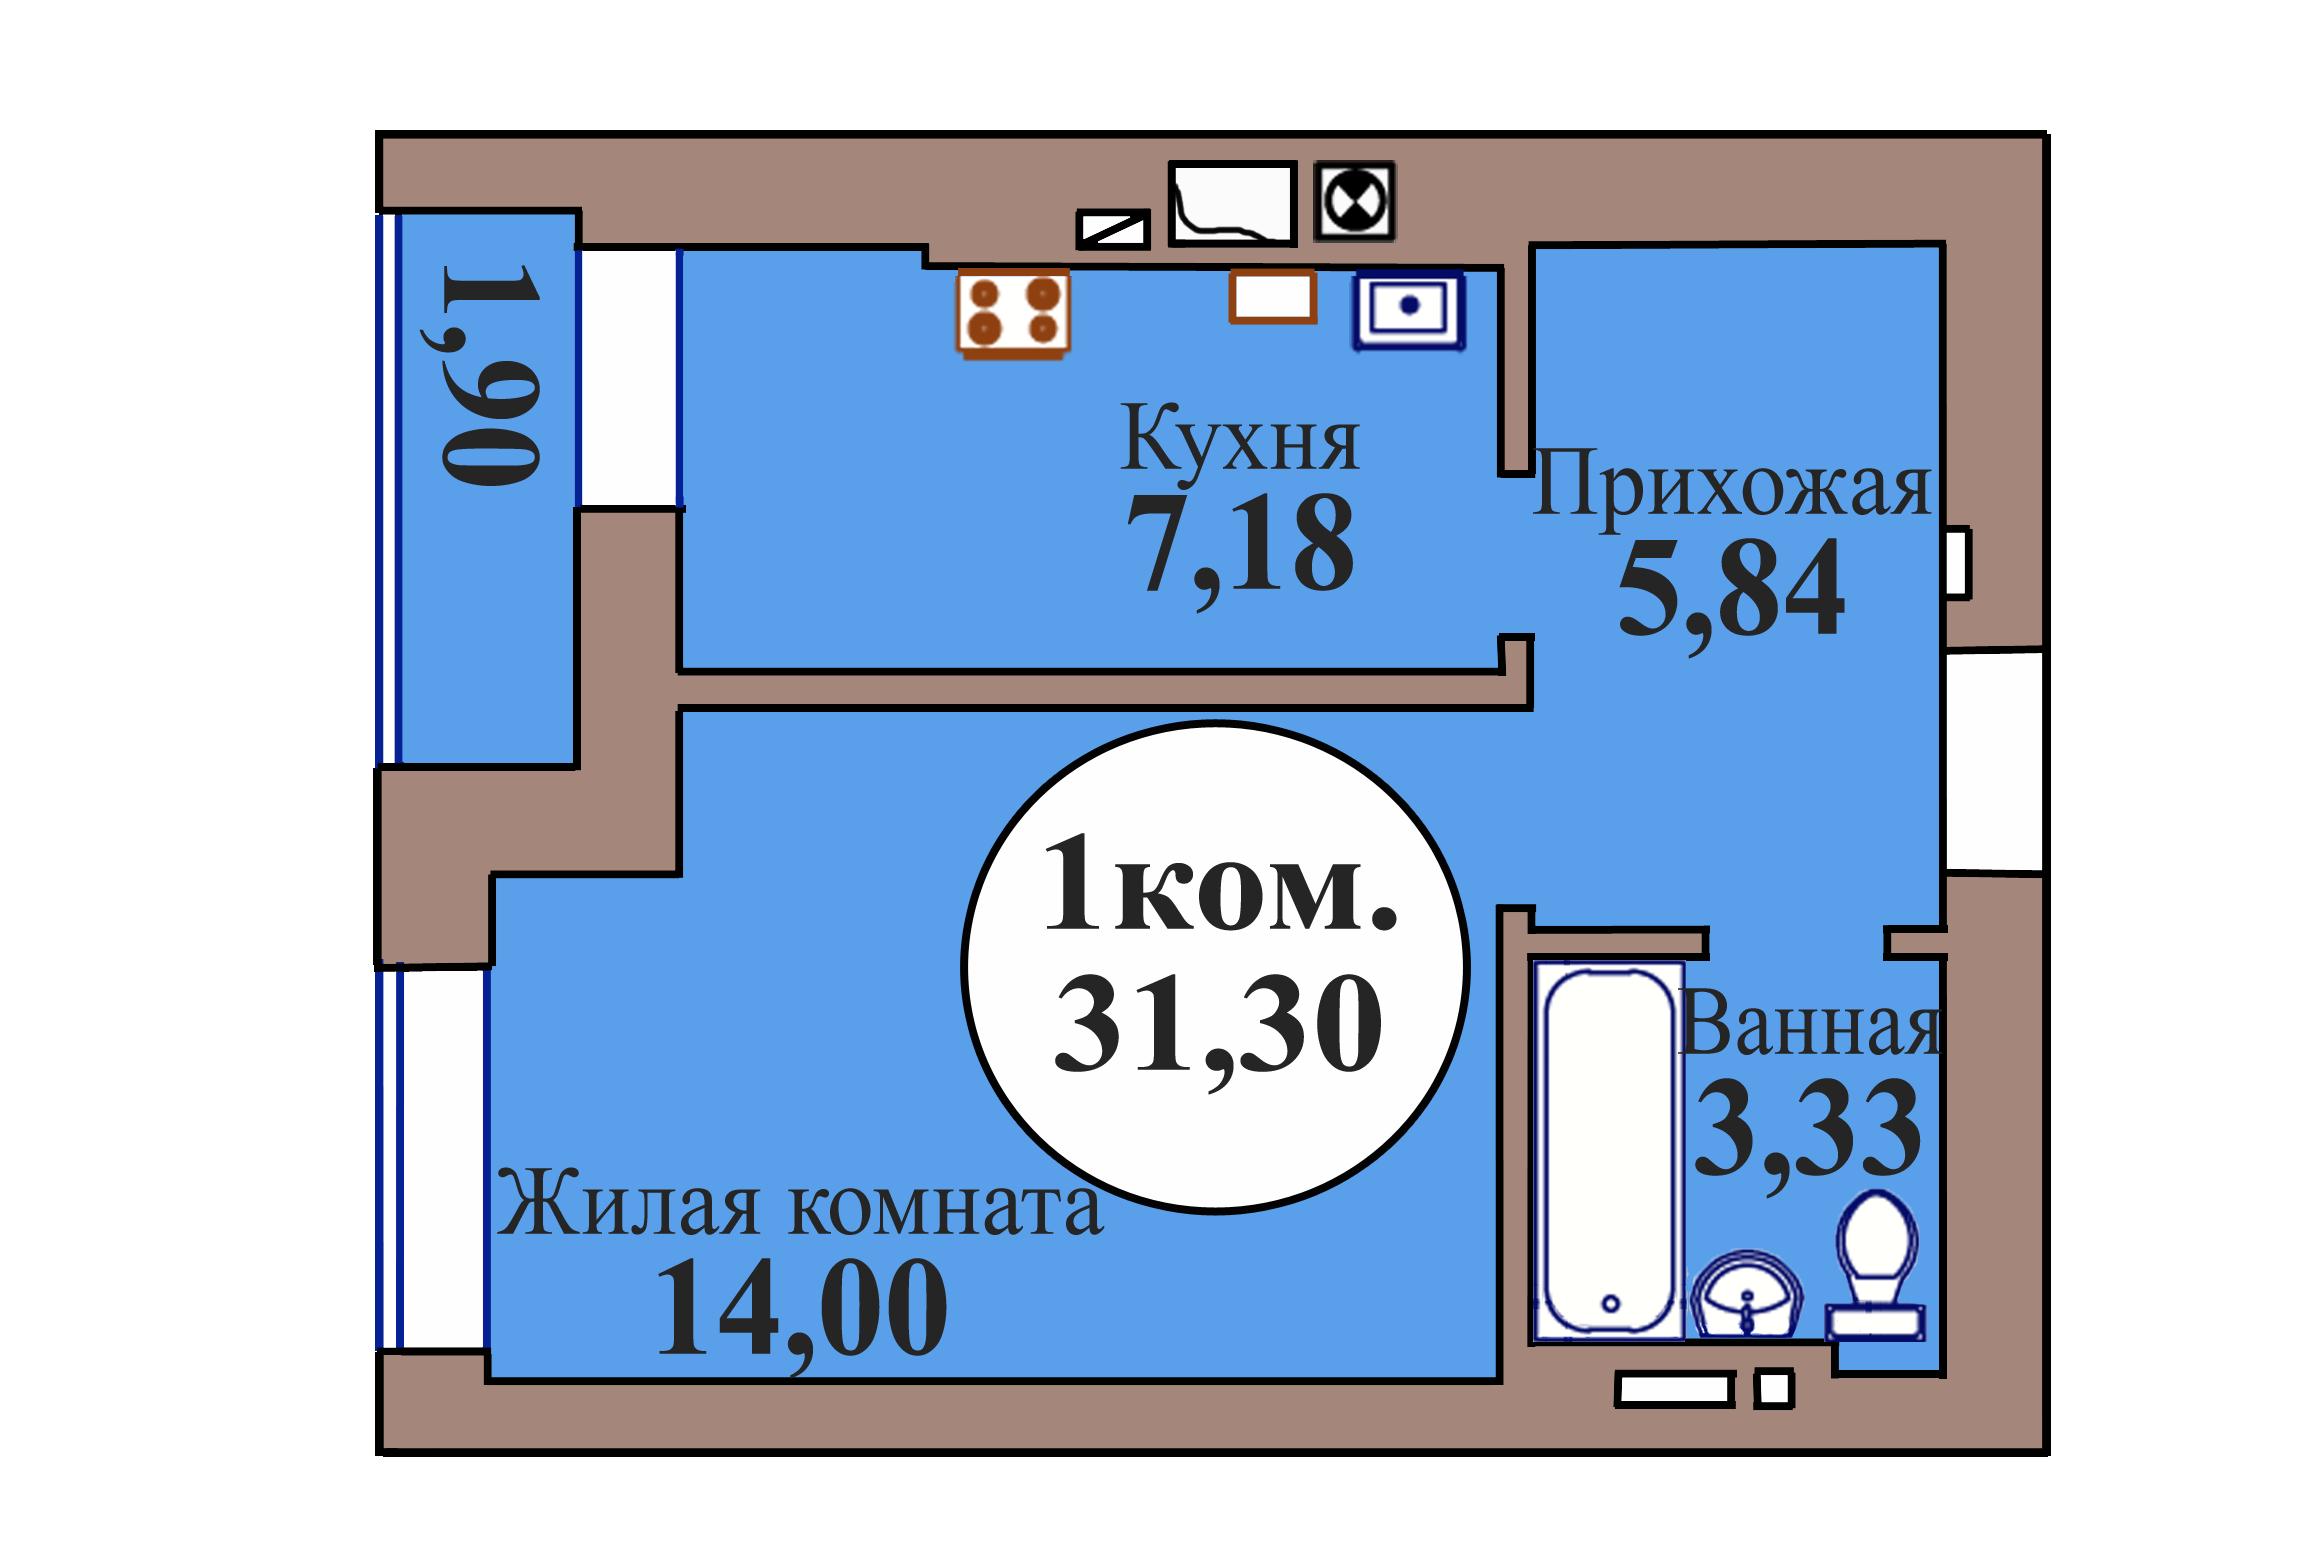 1-комн. кв. по пер. Калининградский, 5 кв. 4 в Калининграде